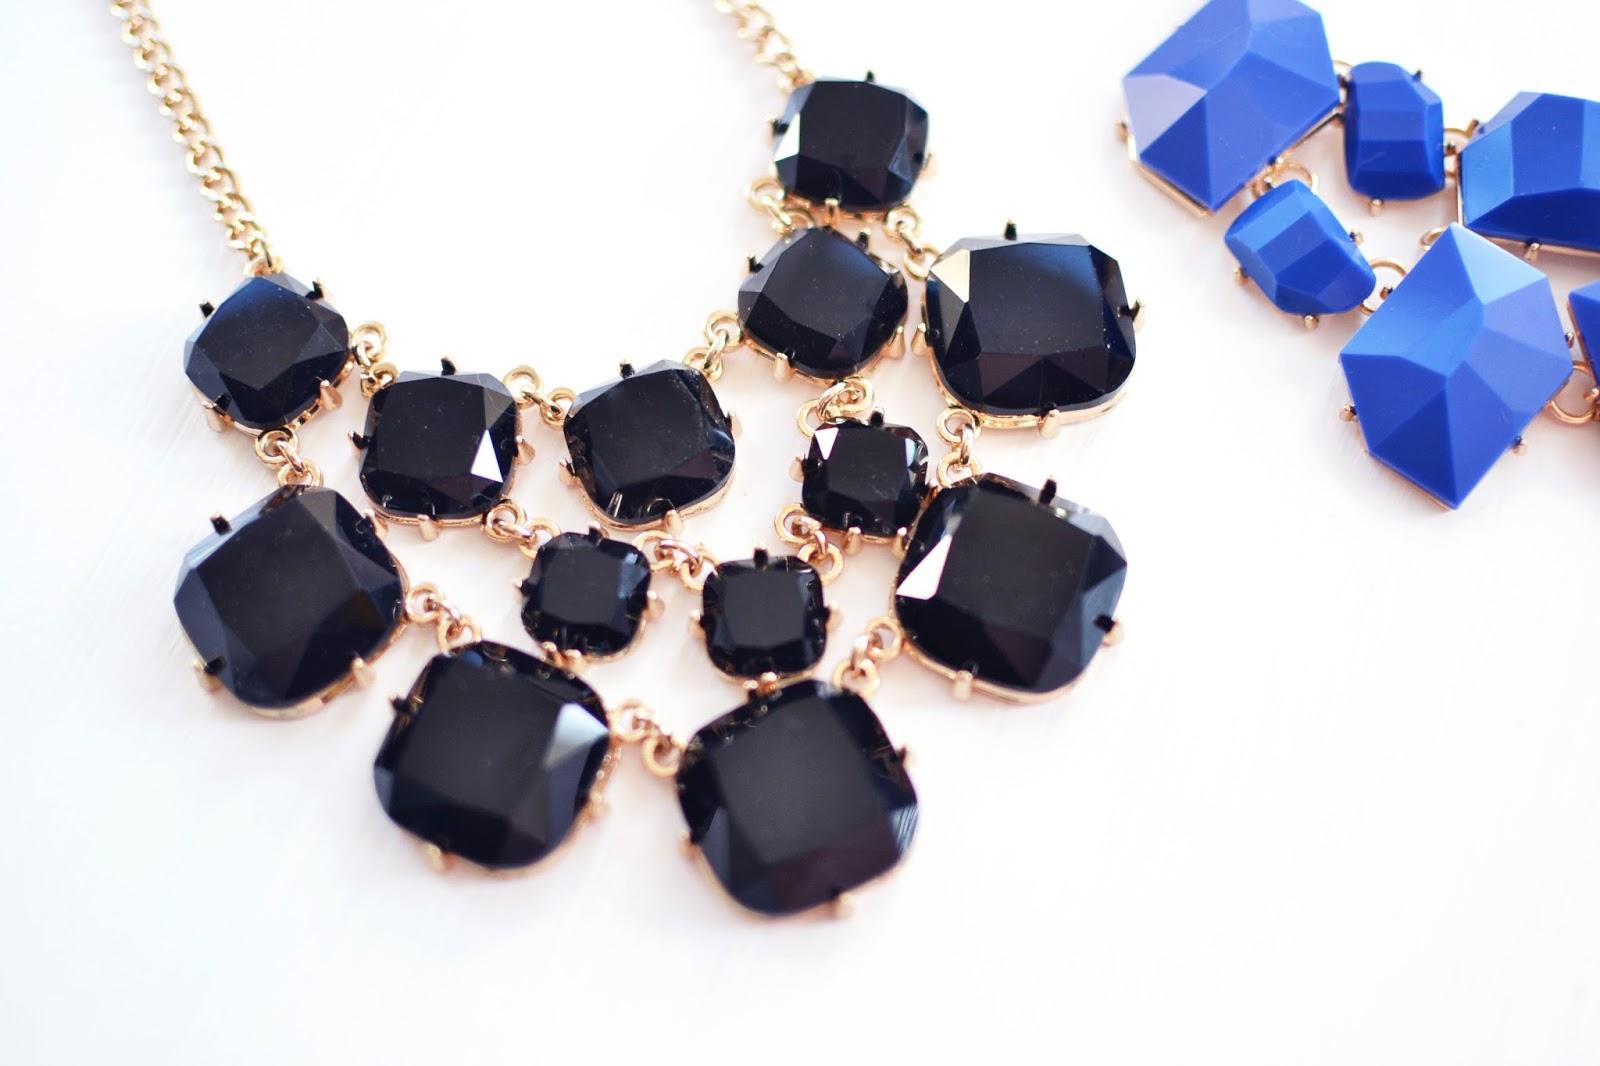 lidl fashion range, affordable statement necklace, statement necklaces